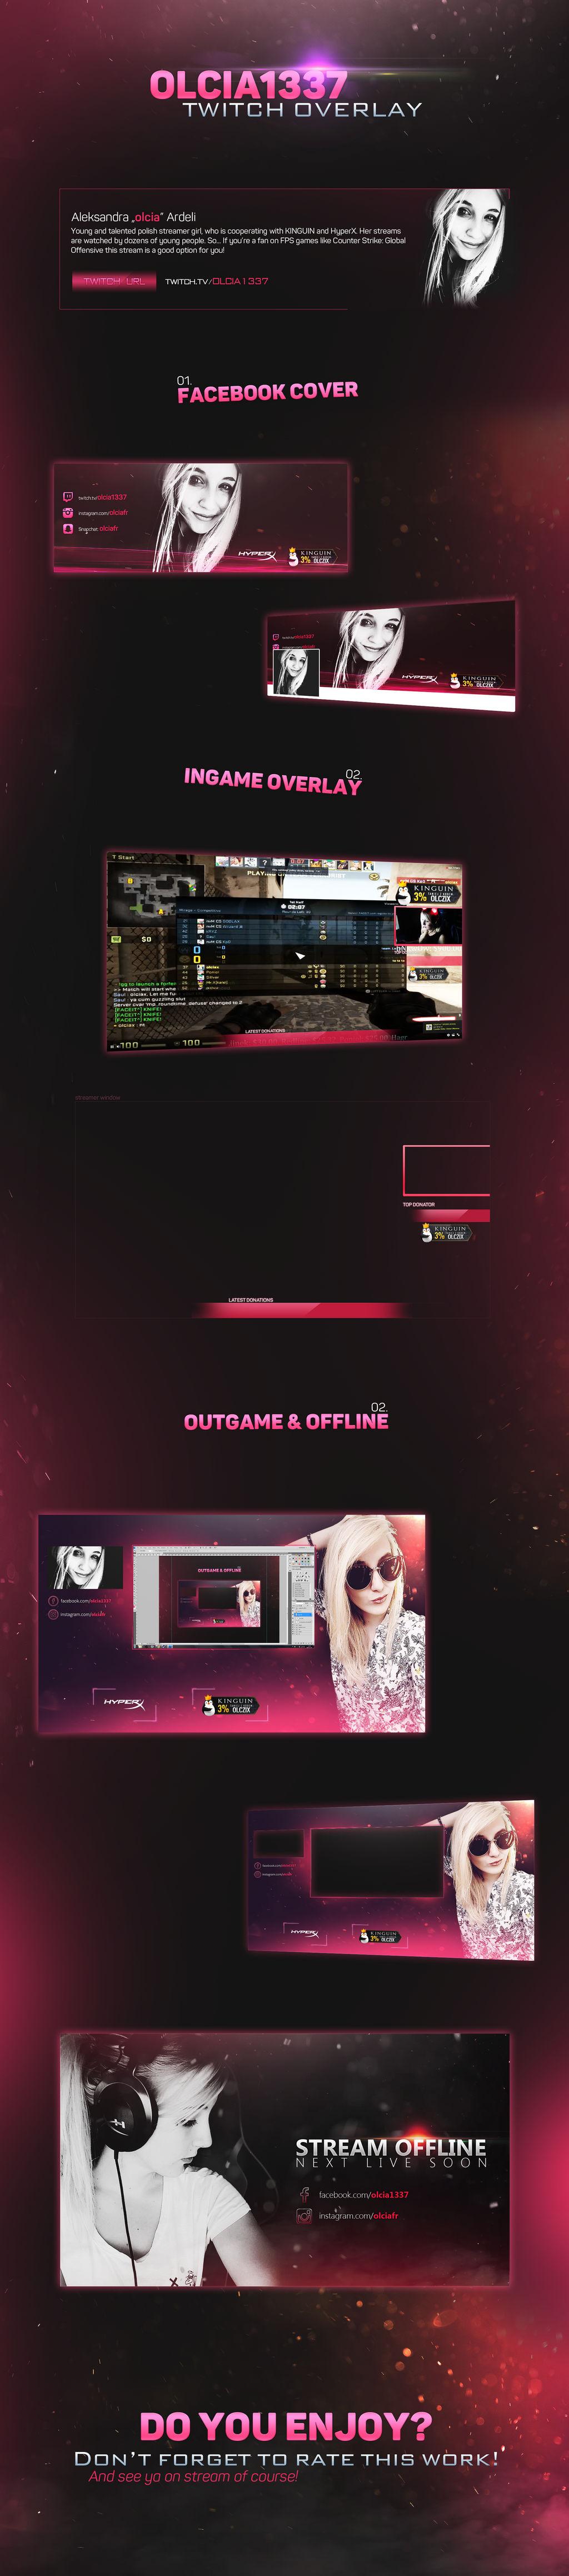 Olcia1337 Twitch stream overlay by inn21 on DeviantArt